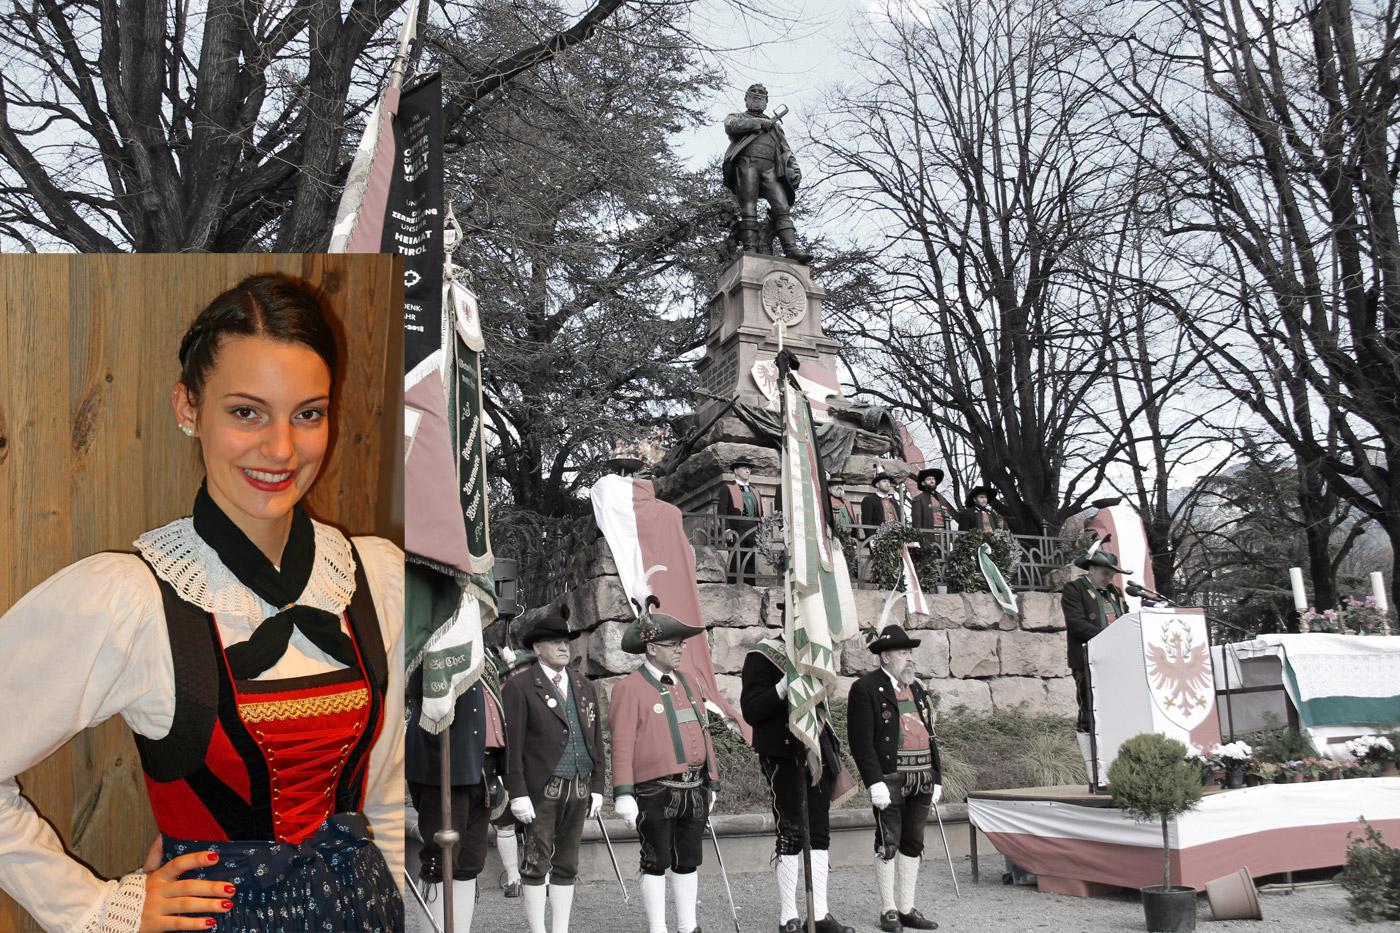 Aufruf zur Teilnahme an der Andreas-Hofer-Landesfeier